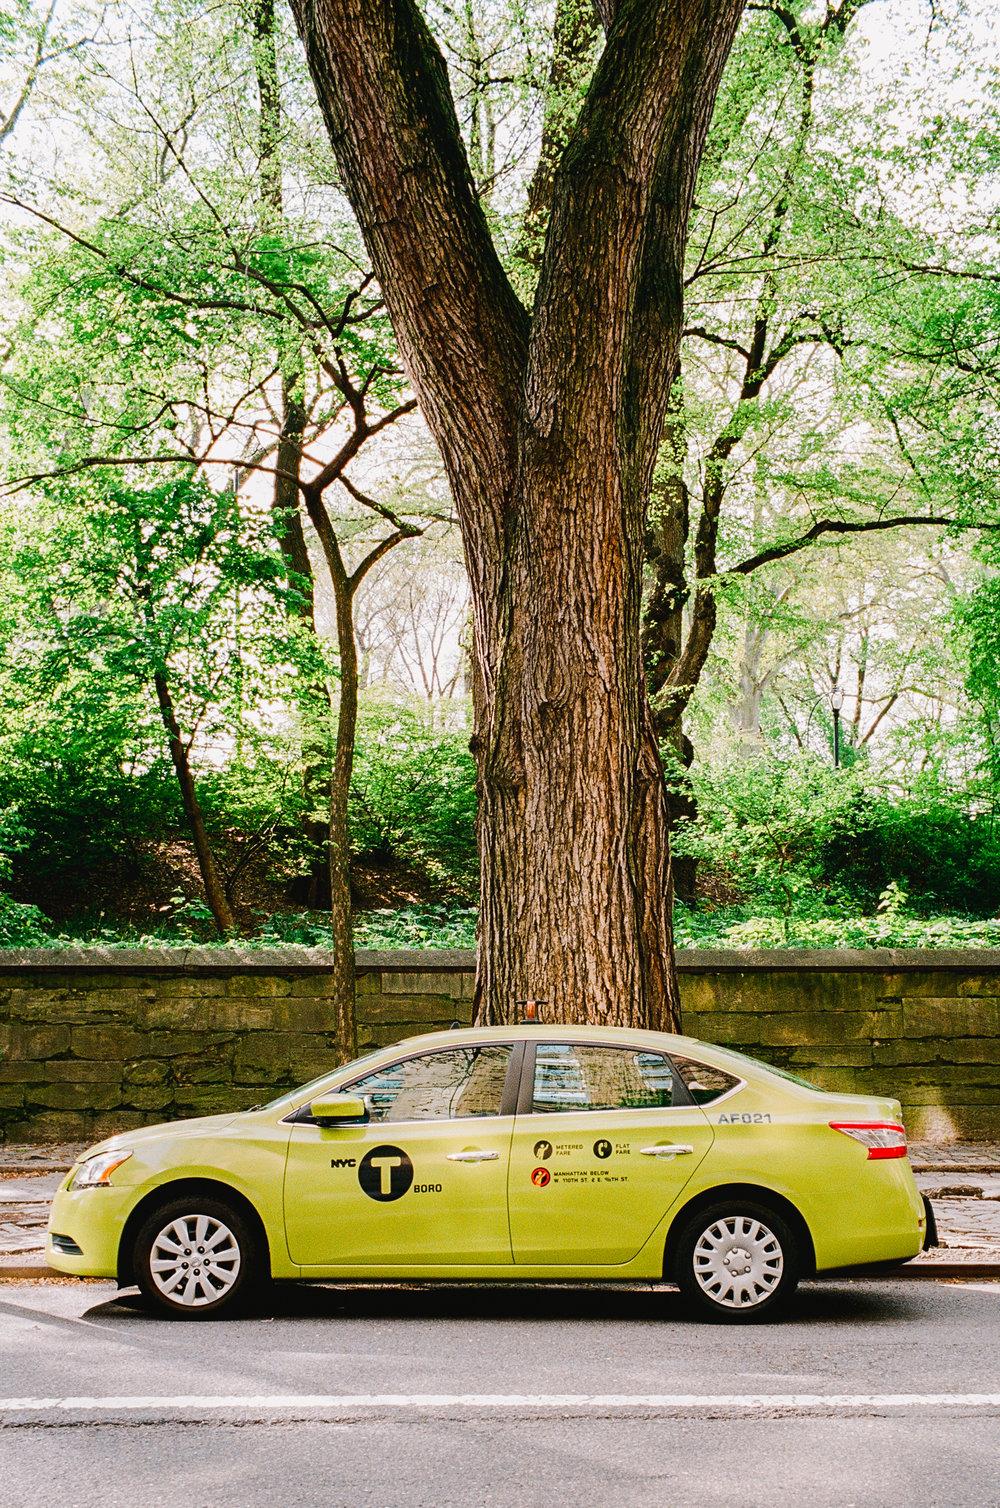 Green Taxi Ektar 100.jpg